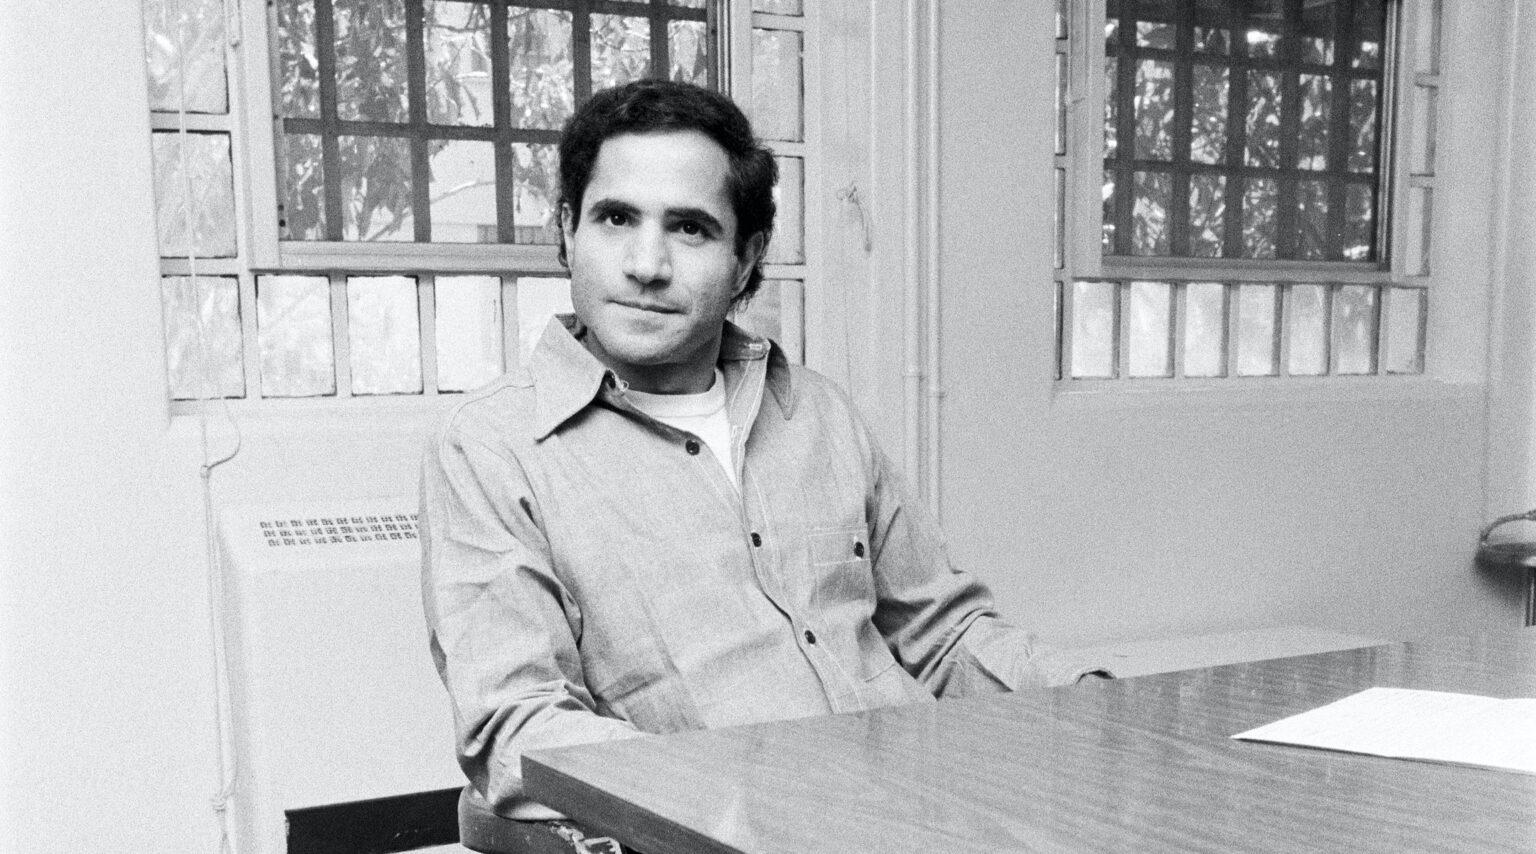 Sirhan Sirhan in 1979. (Photo/JTA-Mirrorpix via Getty Images)